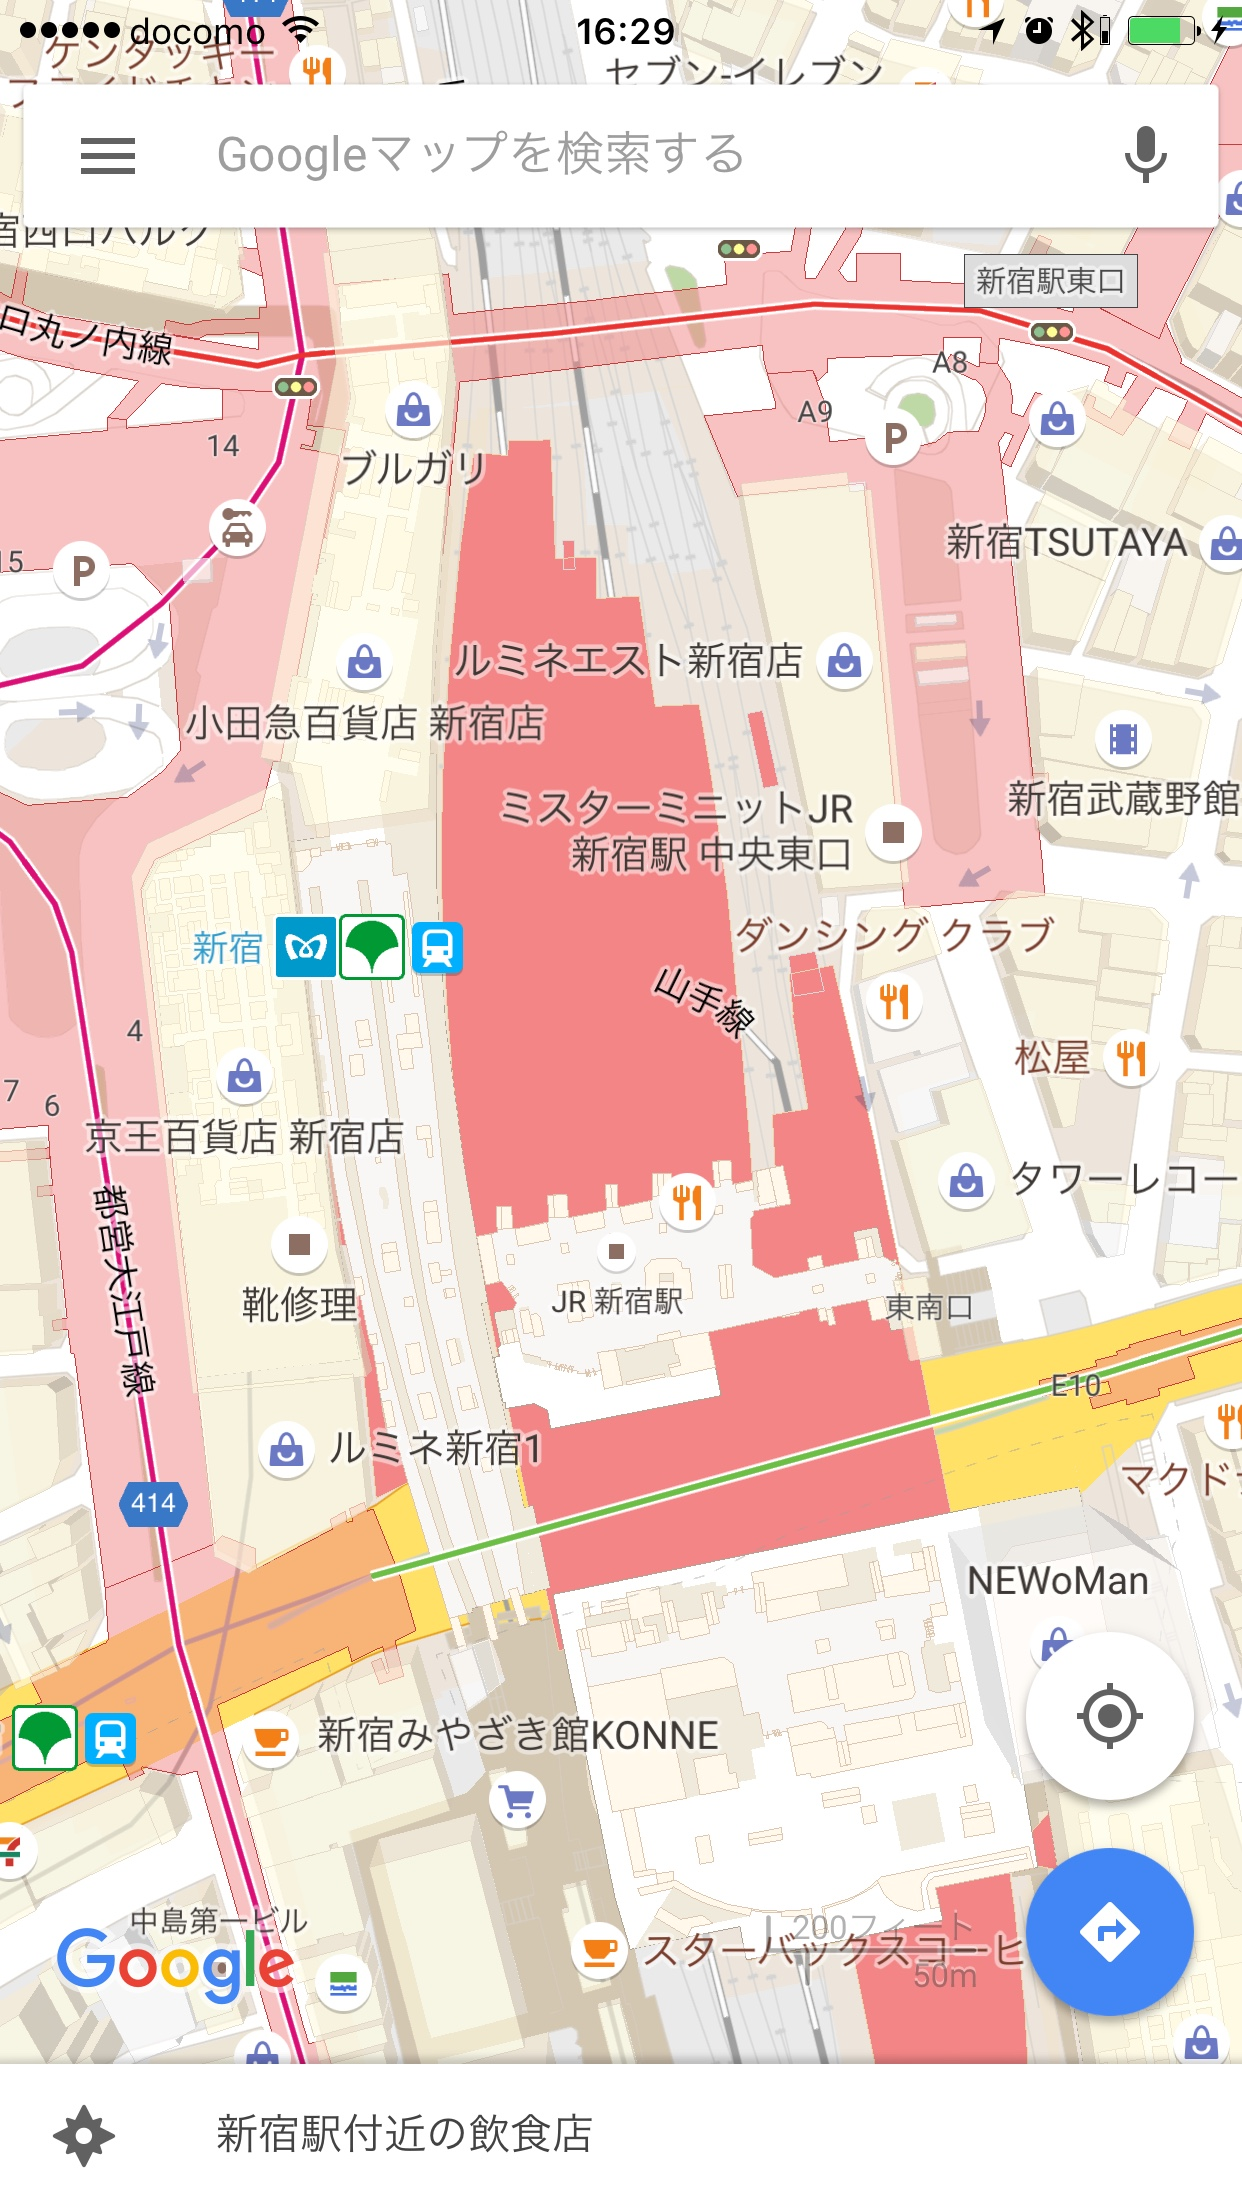 Im At Shinjuku Station But Which Shinjuku Station Are You Talking